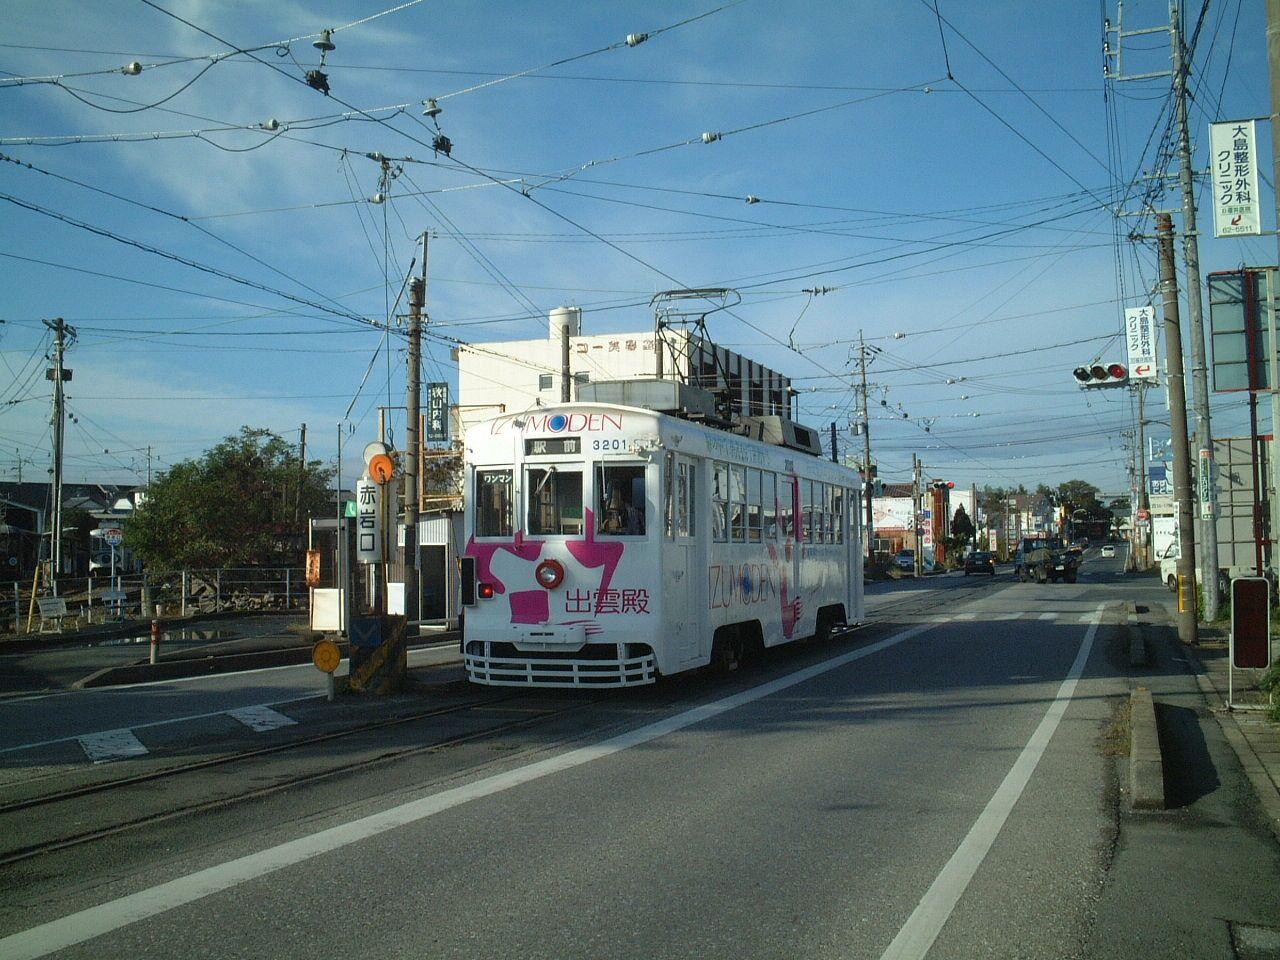 Akaiwa-guchi Station